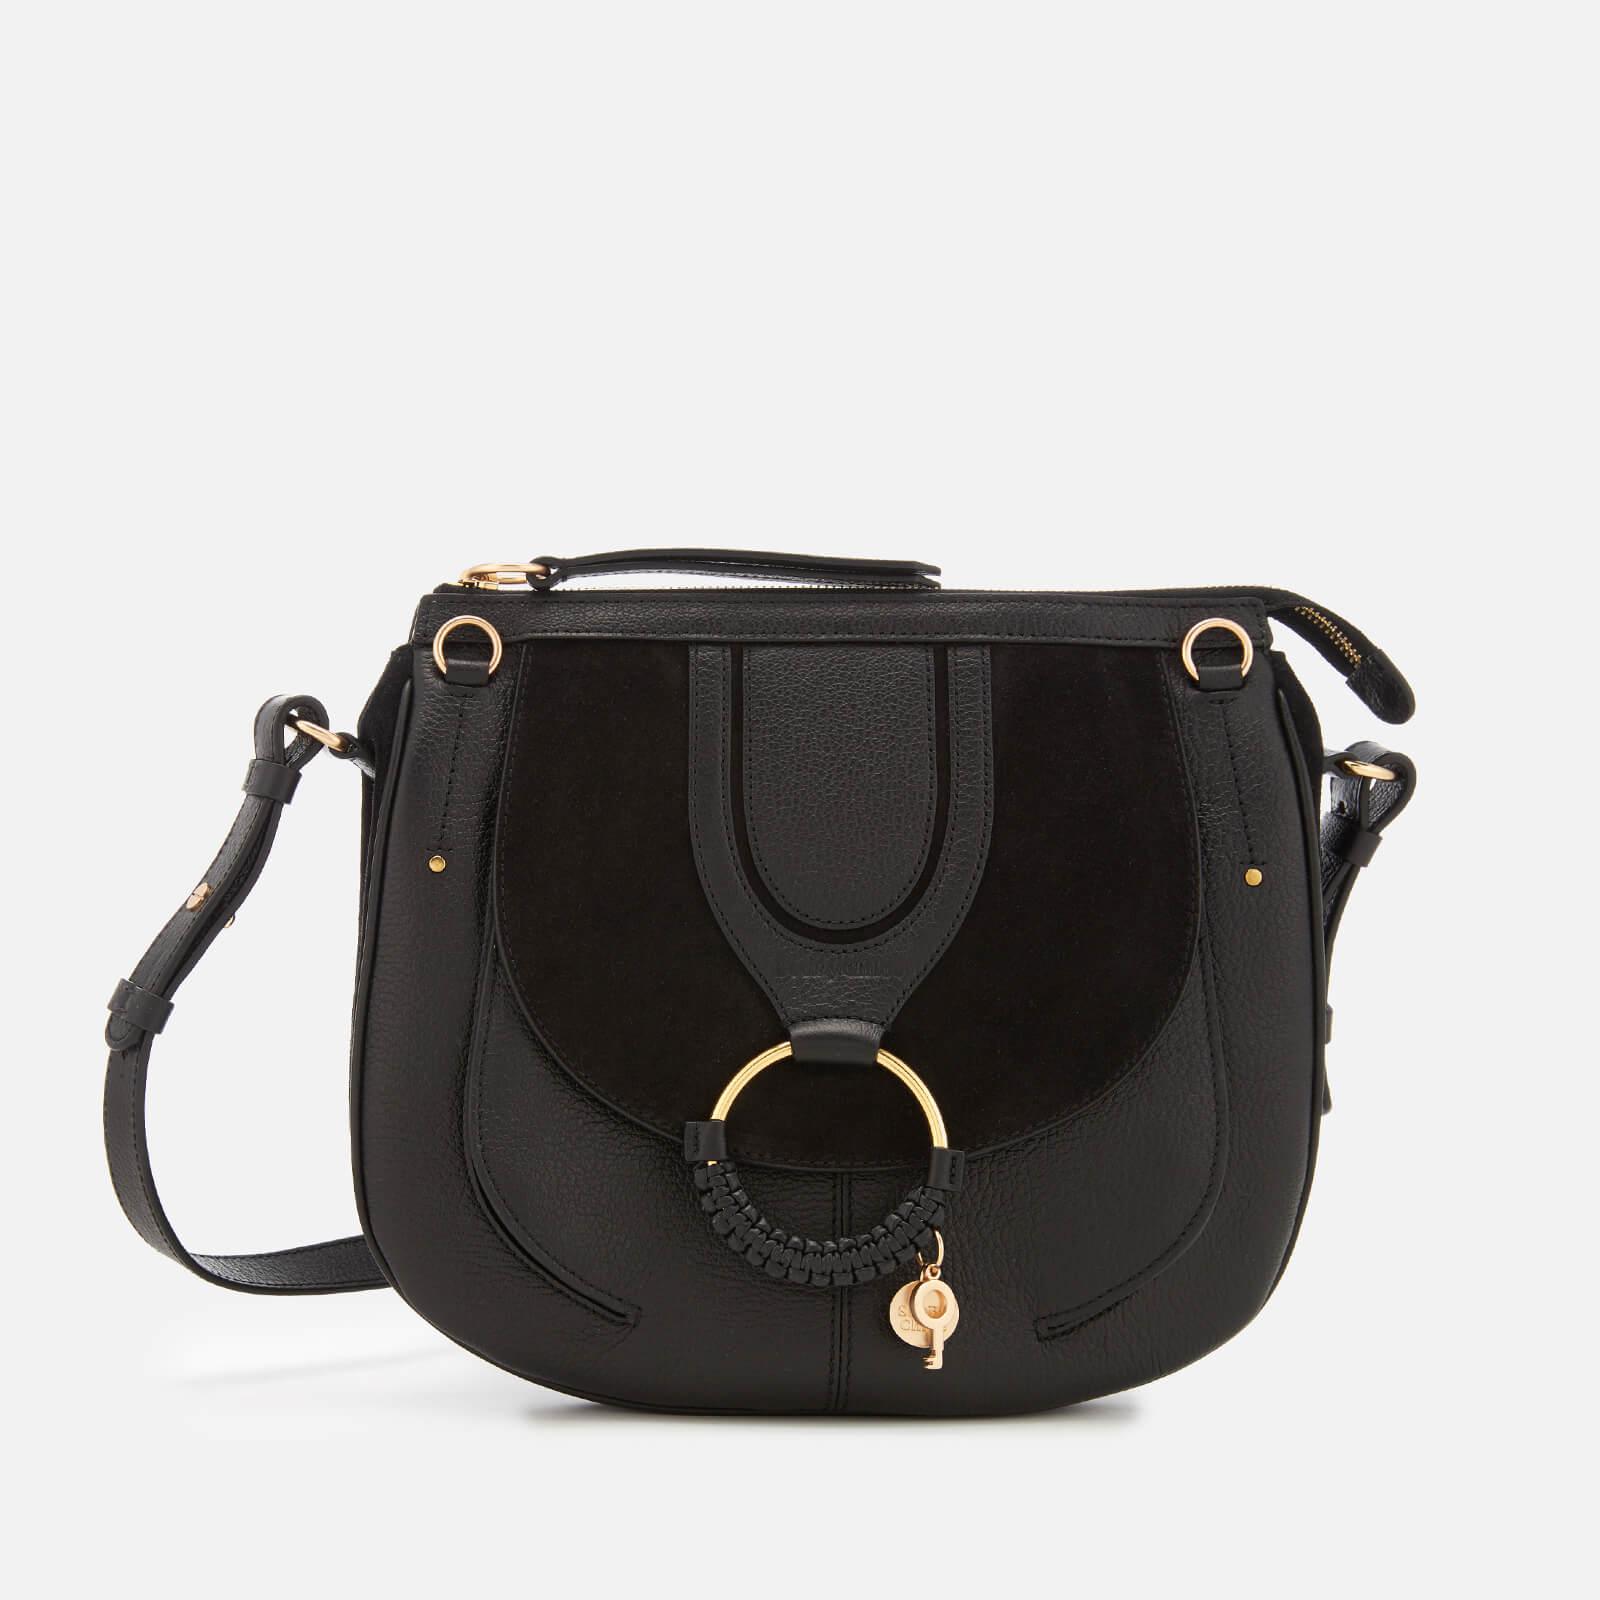 ef0b0c85e3 See By Chloé Women's Hana Shoulder Bag - Black